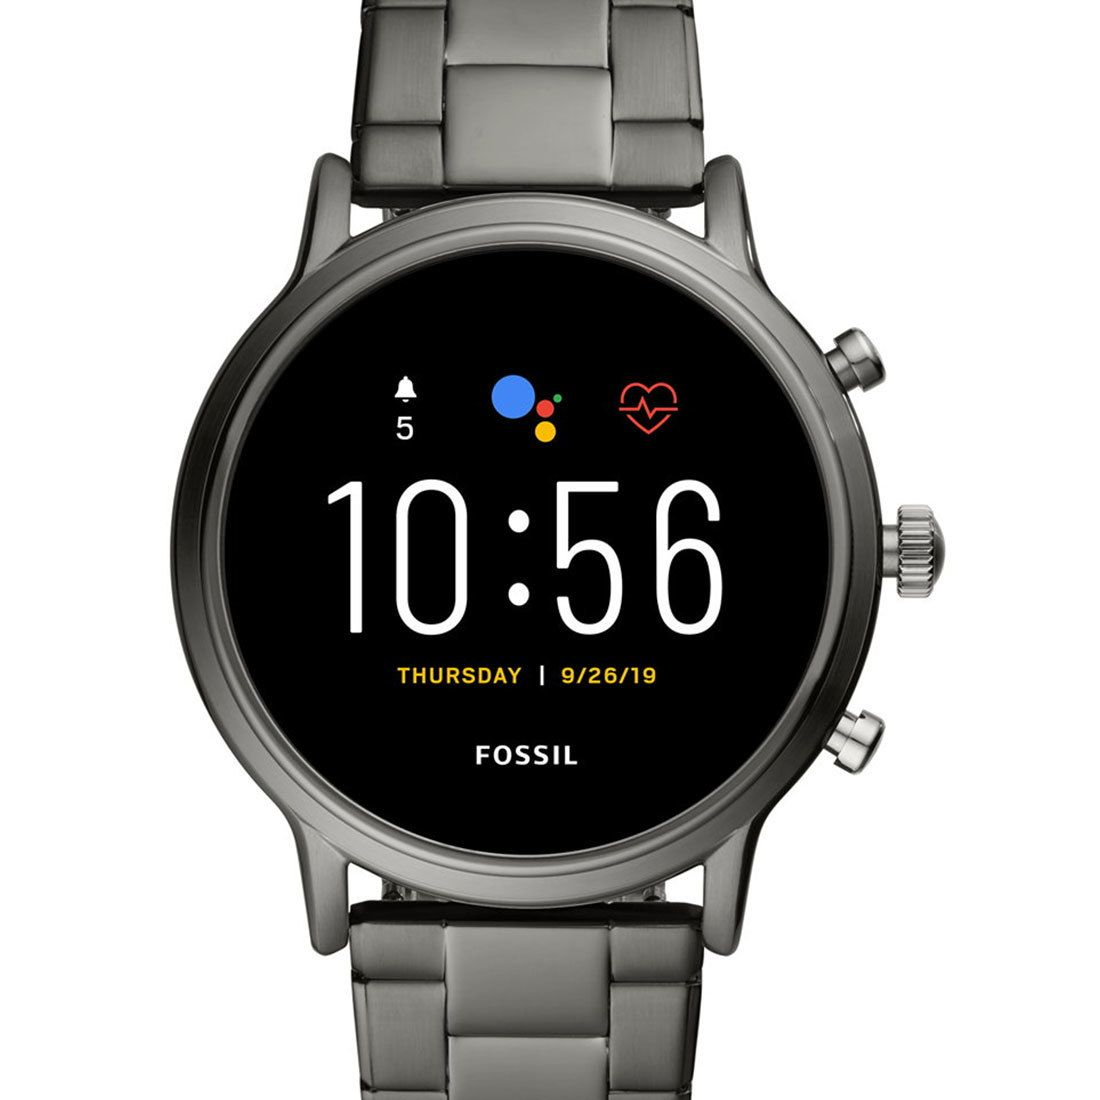 Fossil Carlyle HR Gen 5 Smartwatch FTW4024 (BACKORDER) in